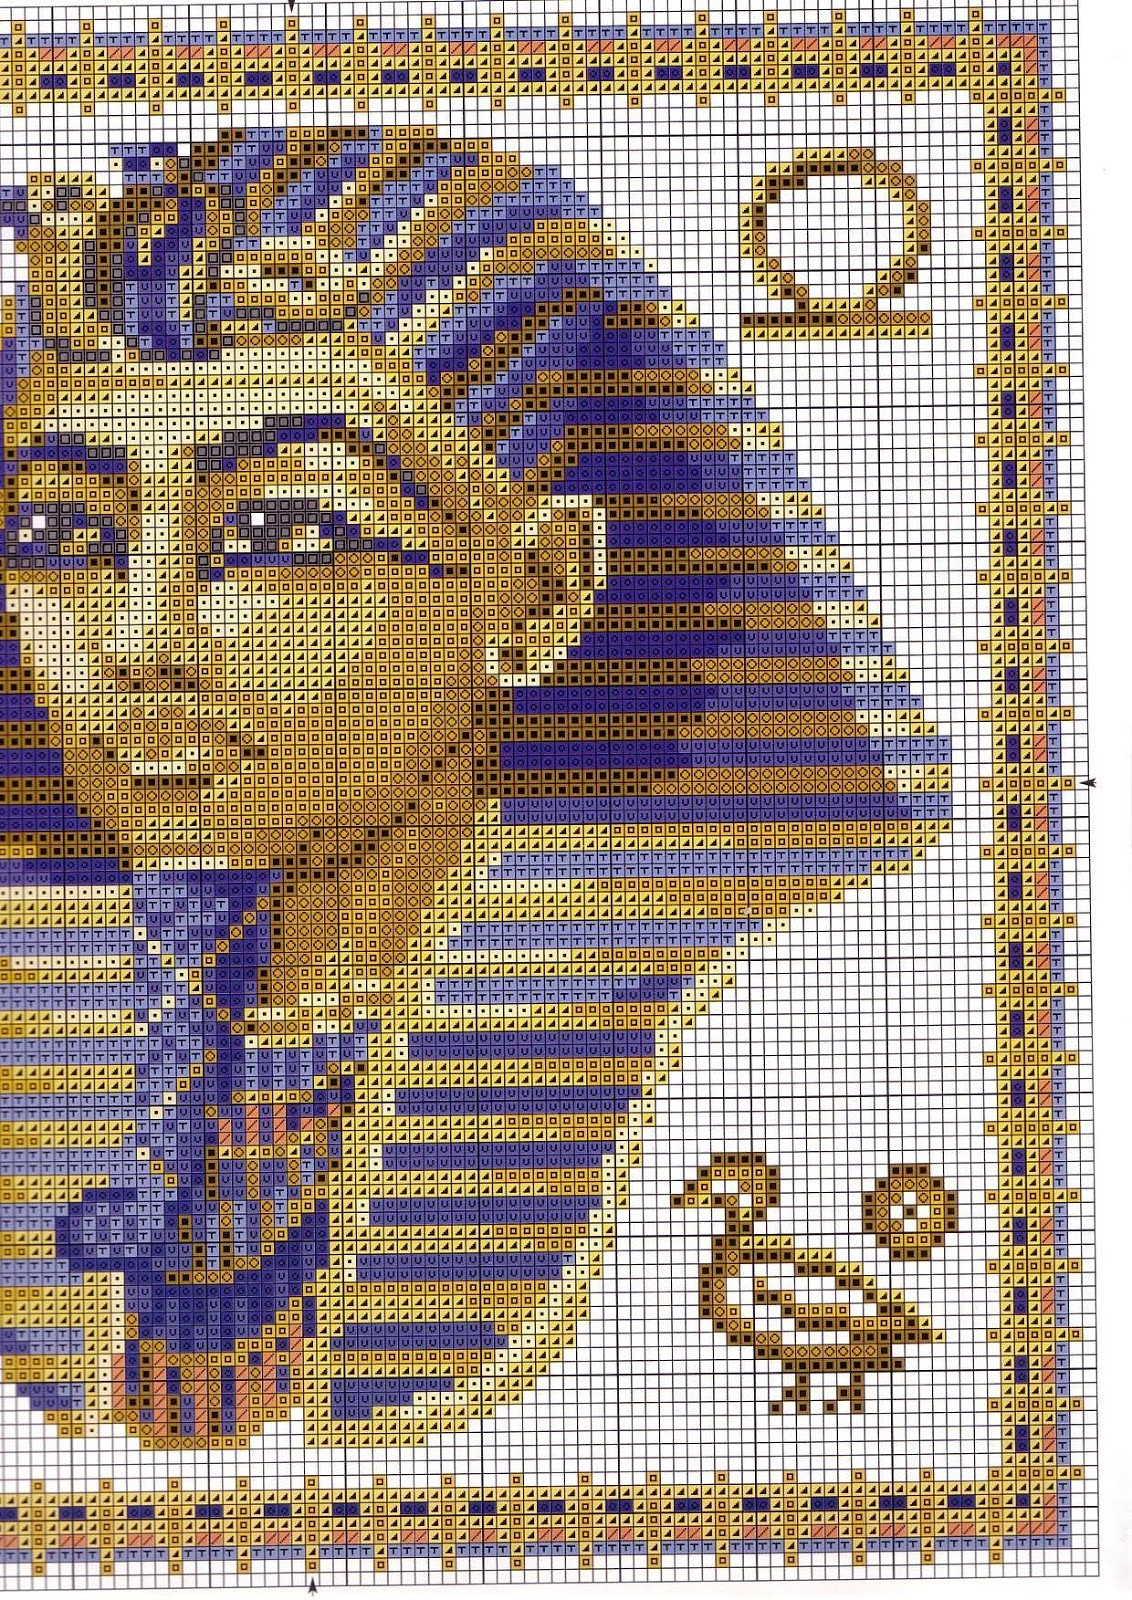 Graficos punto de cruz gratis egipto 14 - Videos de punto de cruz ...